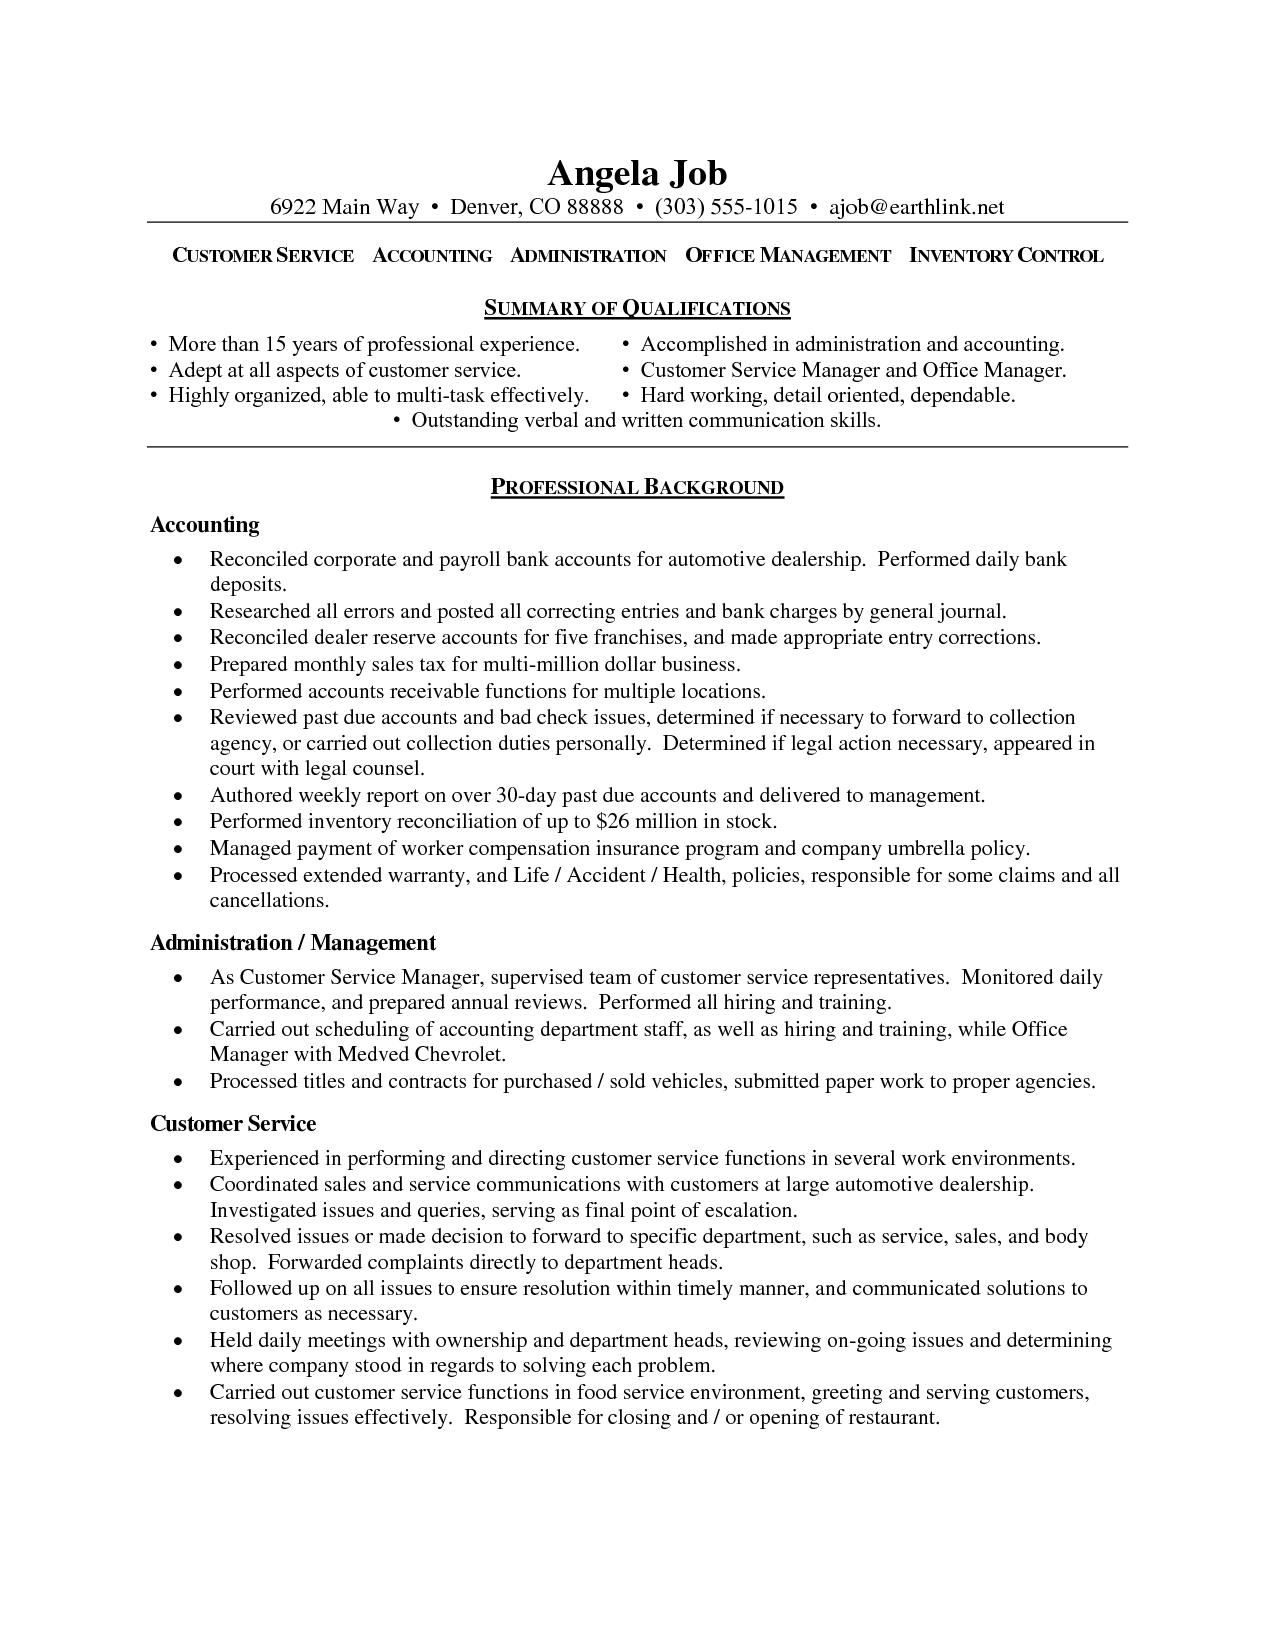 Customer Service Resume 3 Customer Service Resume Customer